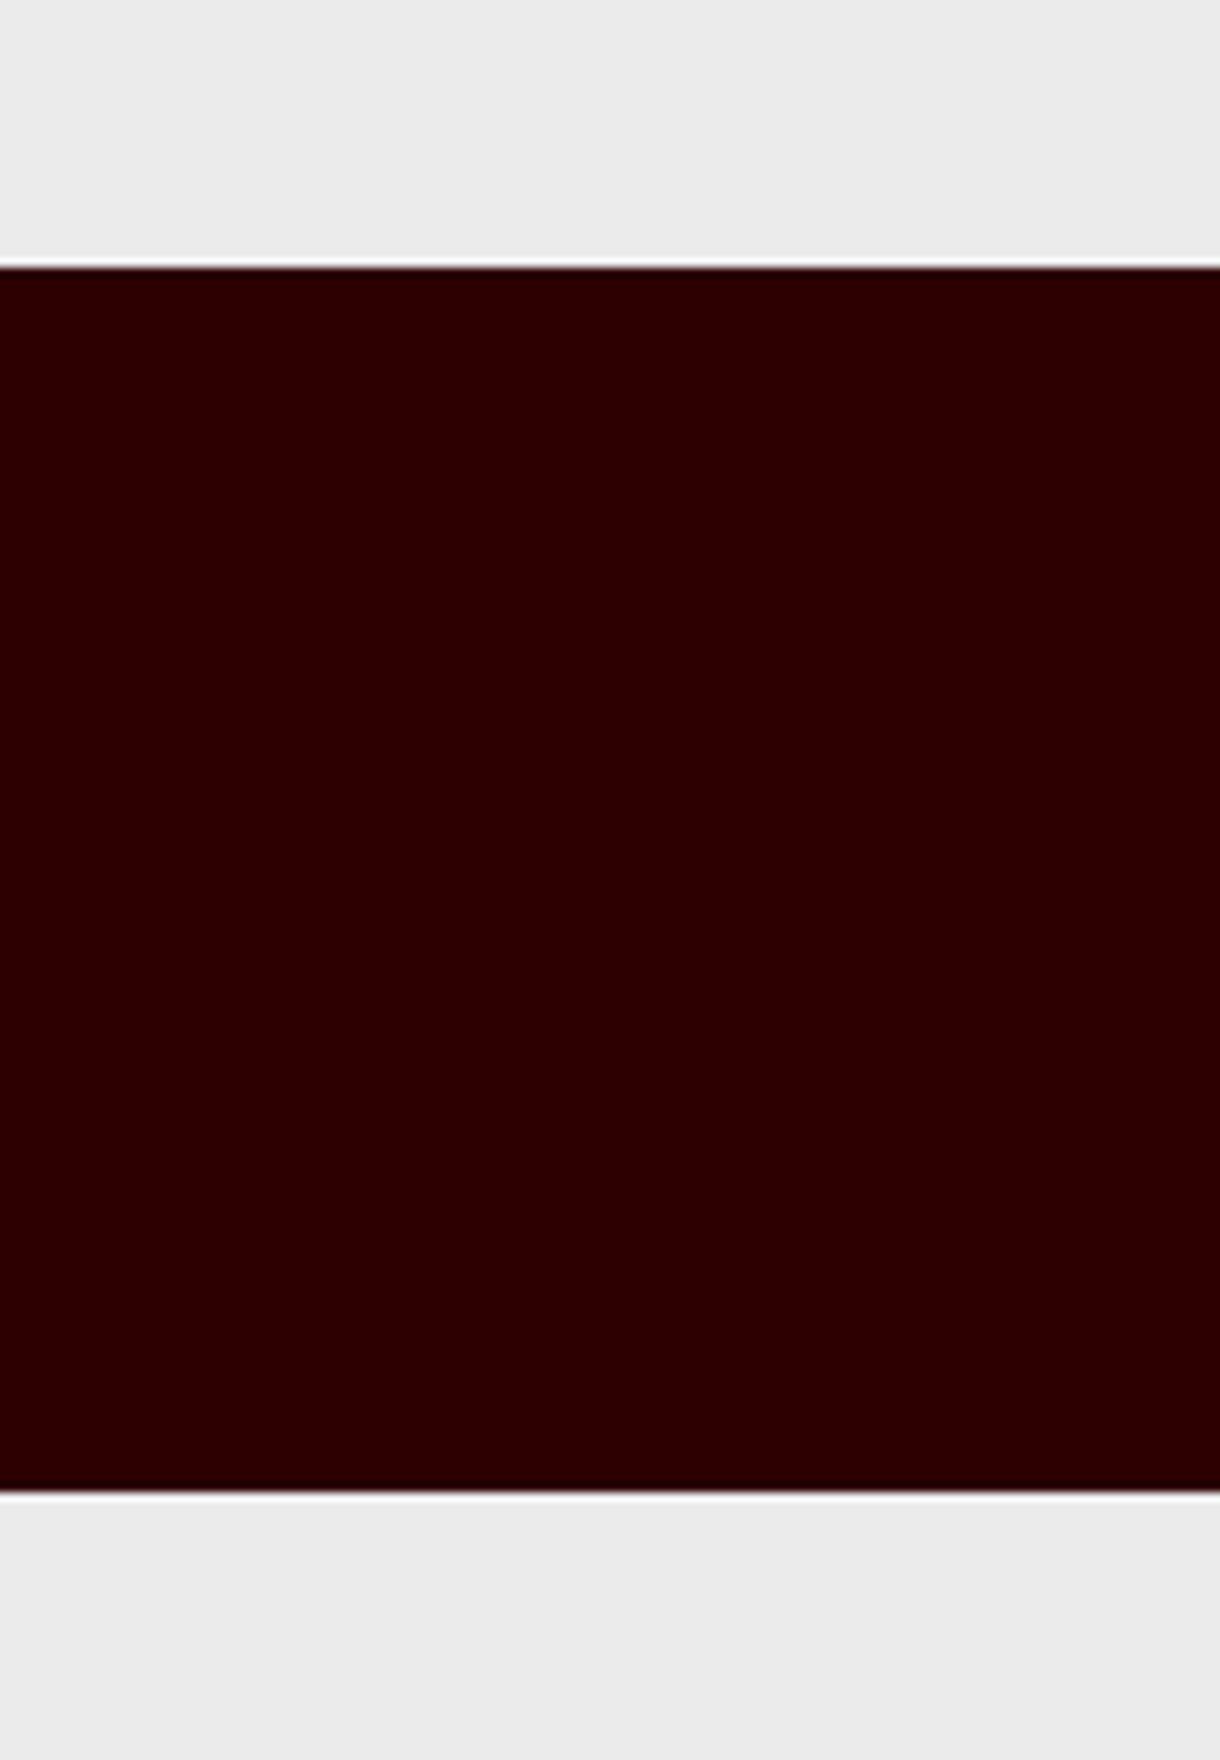 طلاء اظافر مصغر - 16 روج نوار